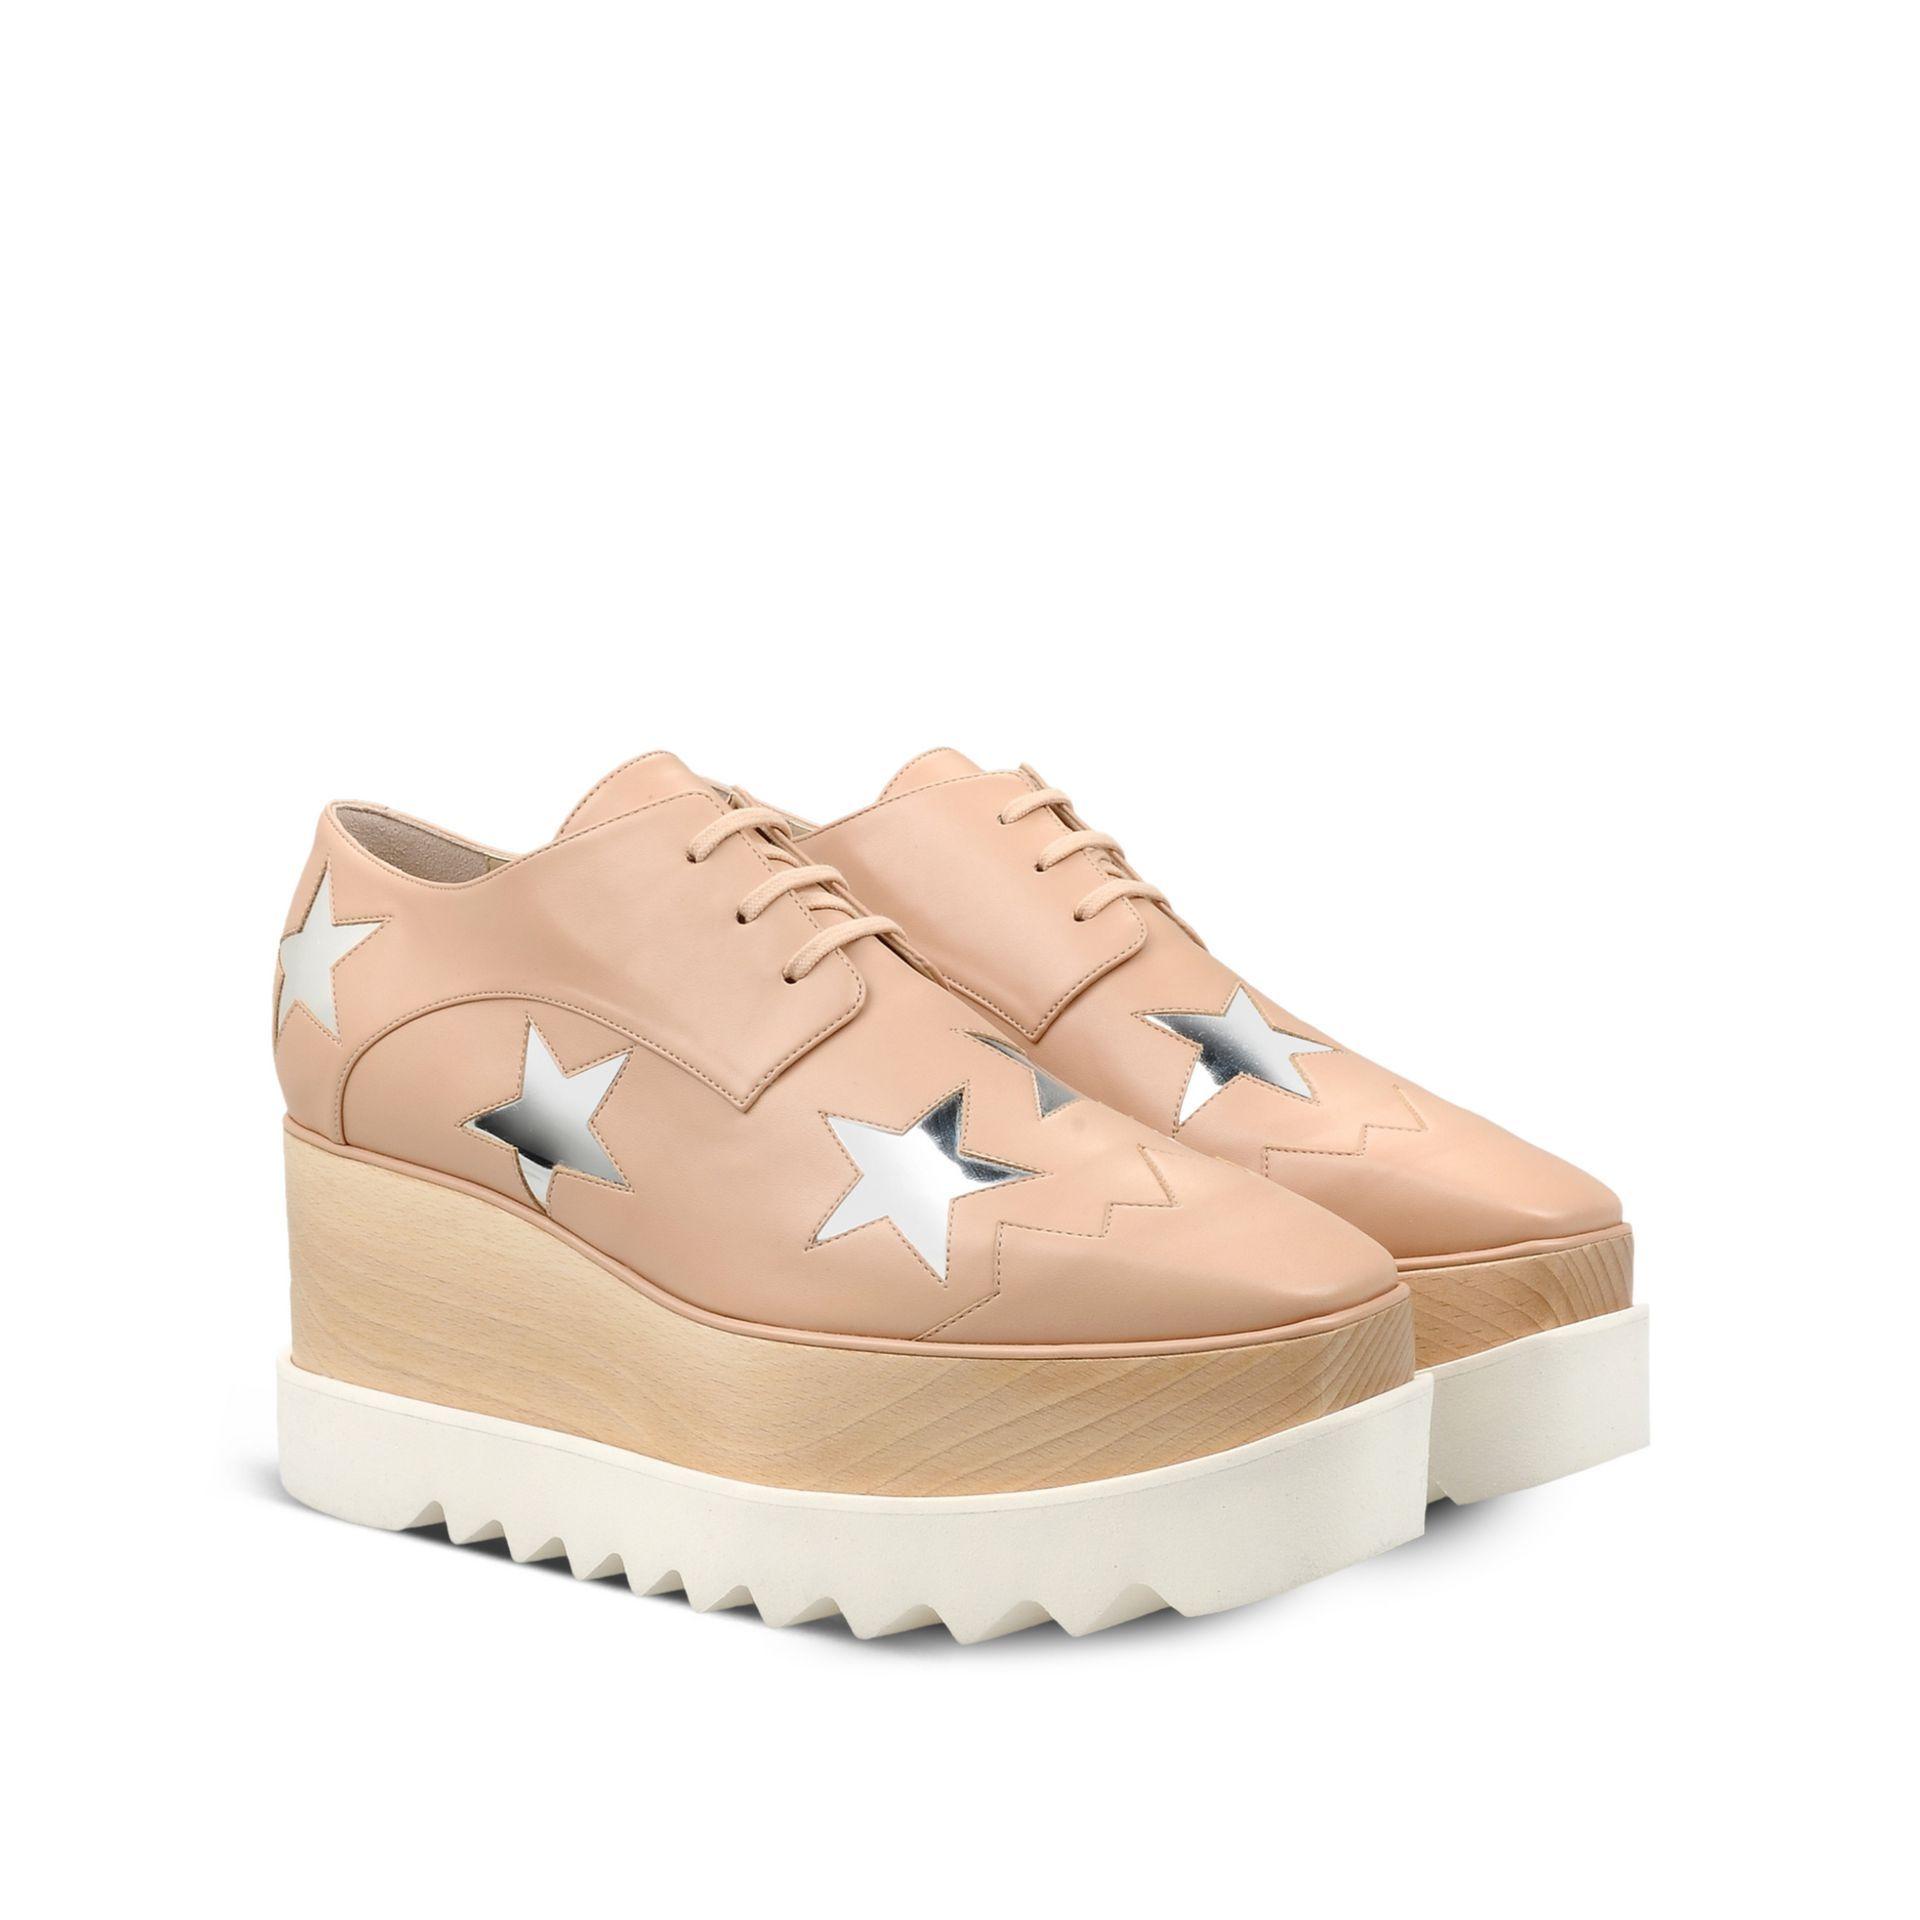 Chaussures De Sport Sangle Métallique Stella Mccartney vYzW9K0q